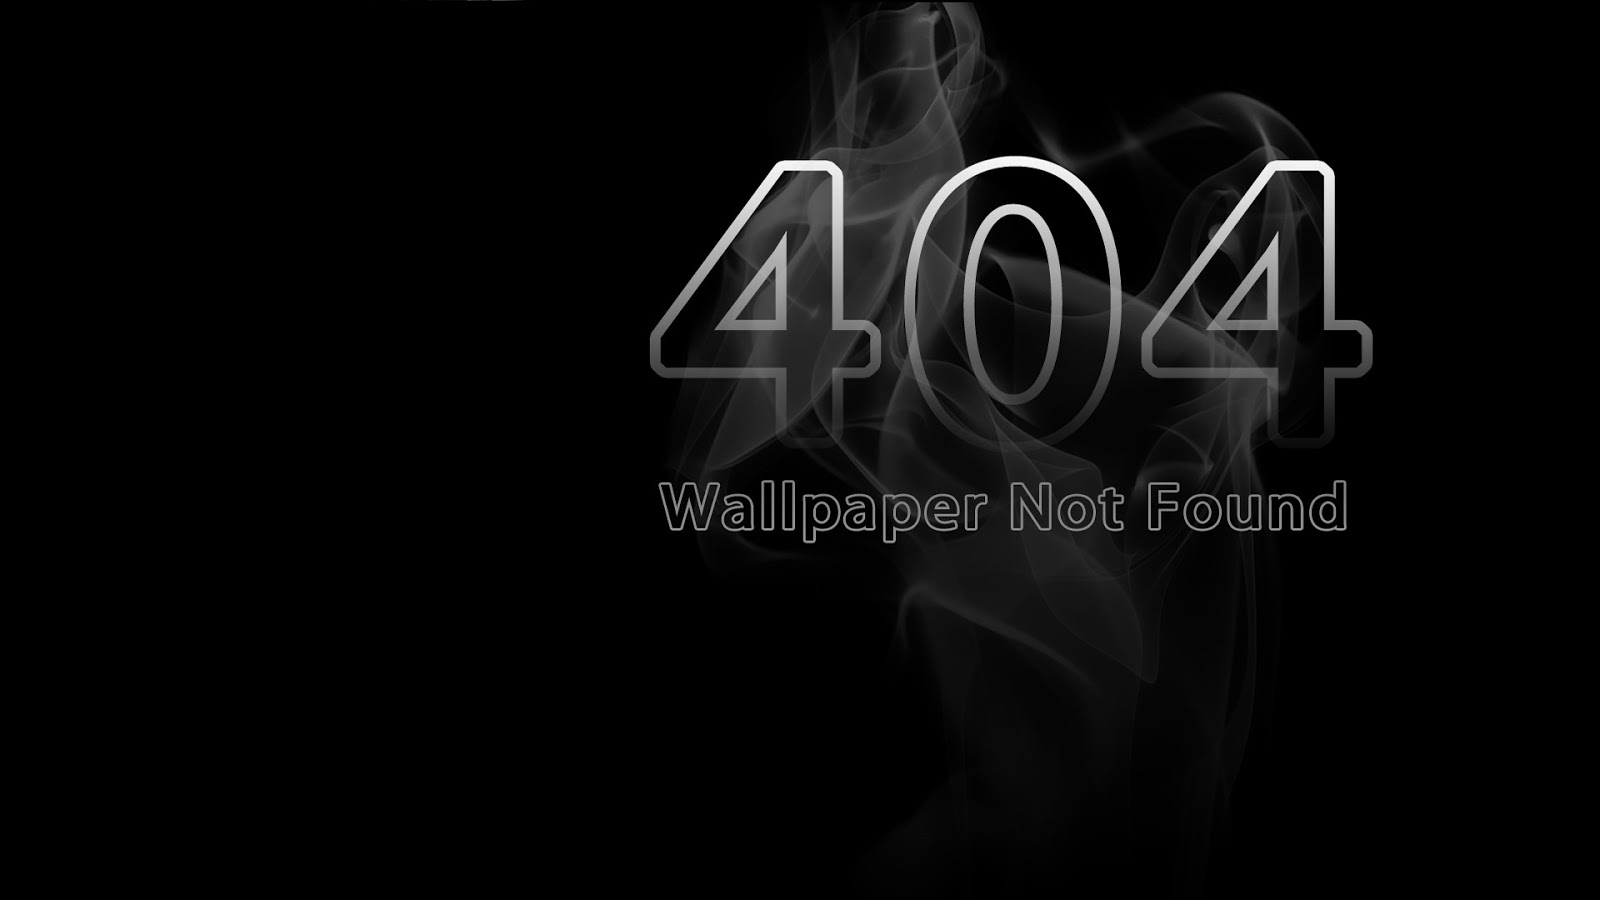 404 Wallpaper not Found